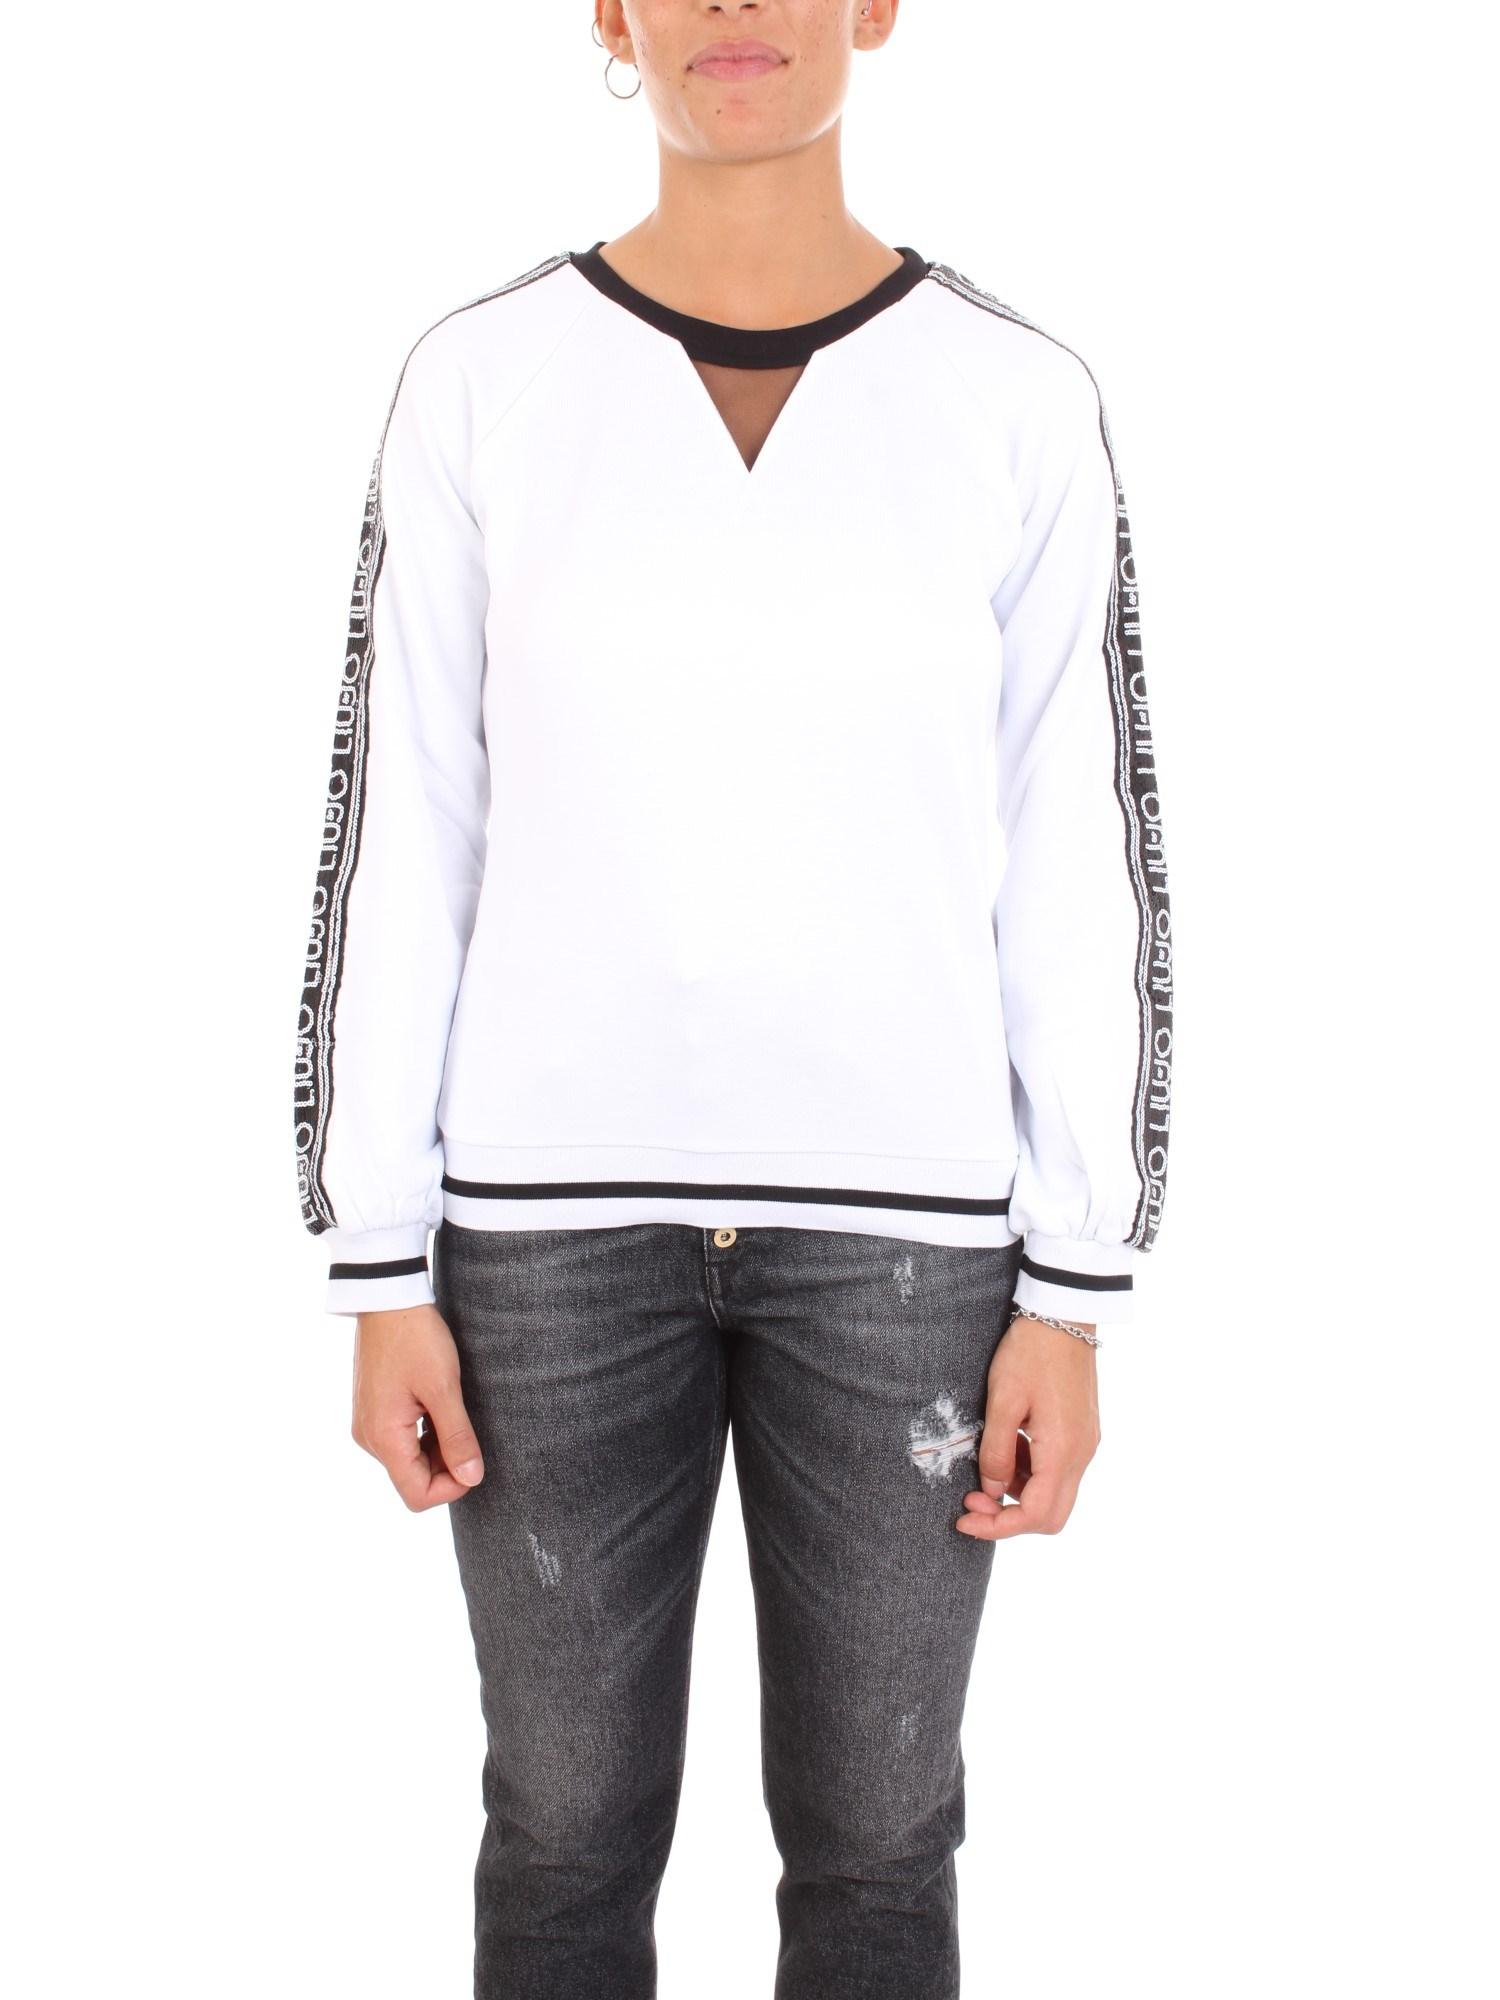 renombre mundial en venta en línea como serch Sportswear Liu Jo T69107 F0791 Sweat-Shirt Femme M Vêtements ...